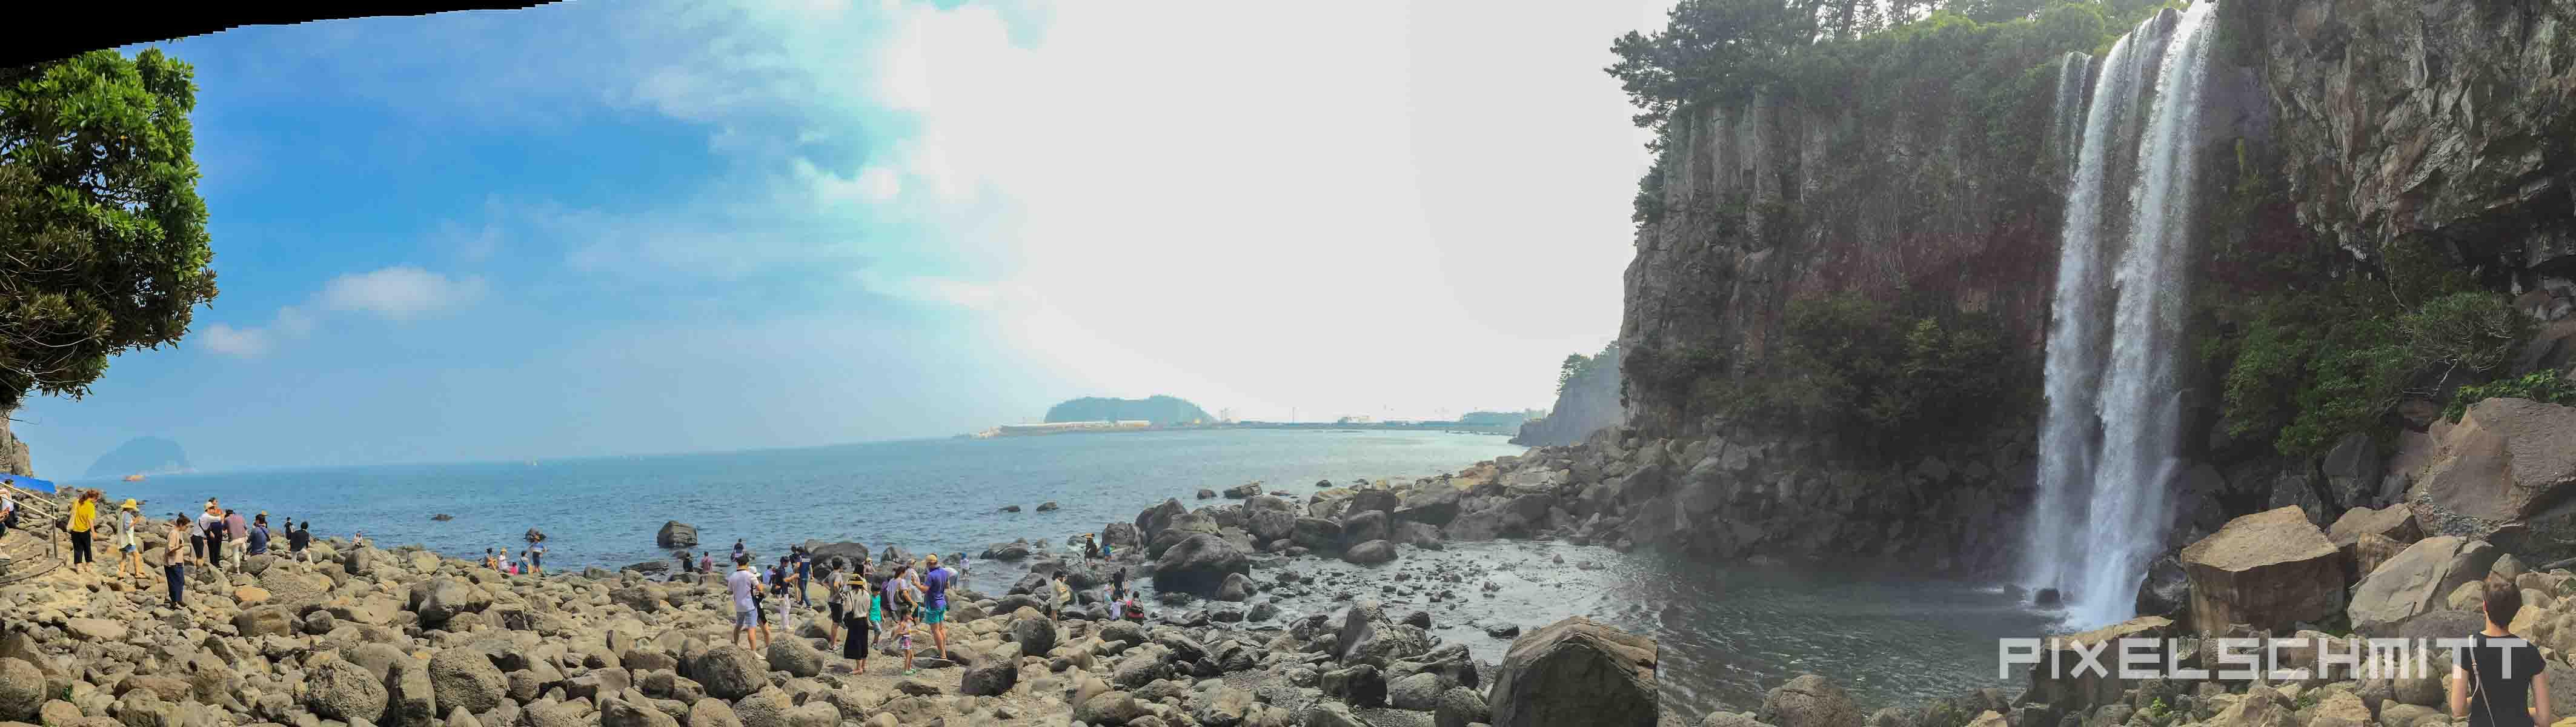 Jeju Island Südkorea Wasserfall